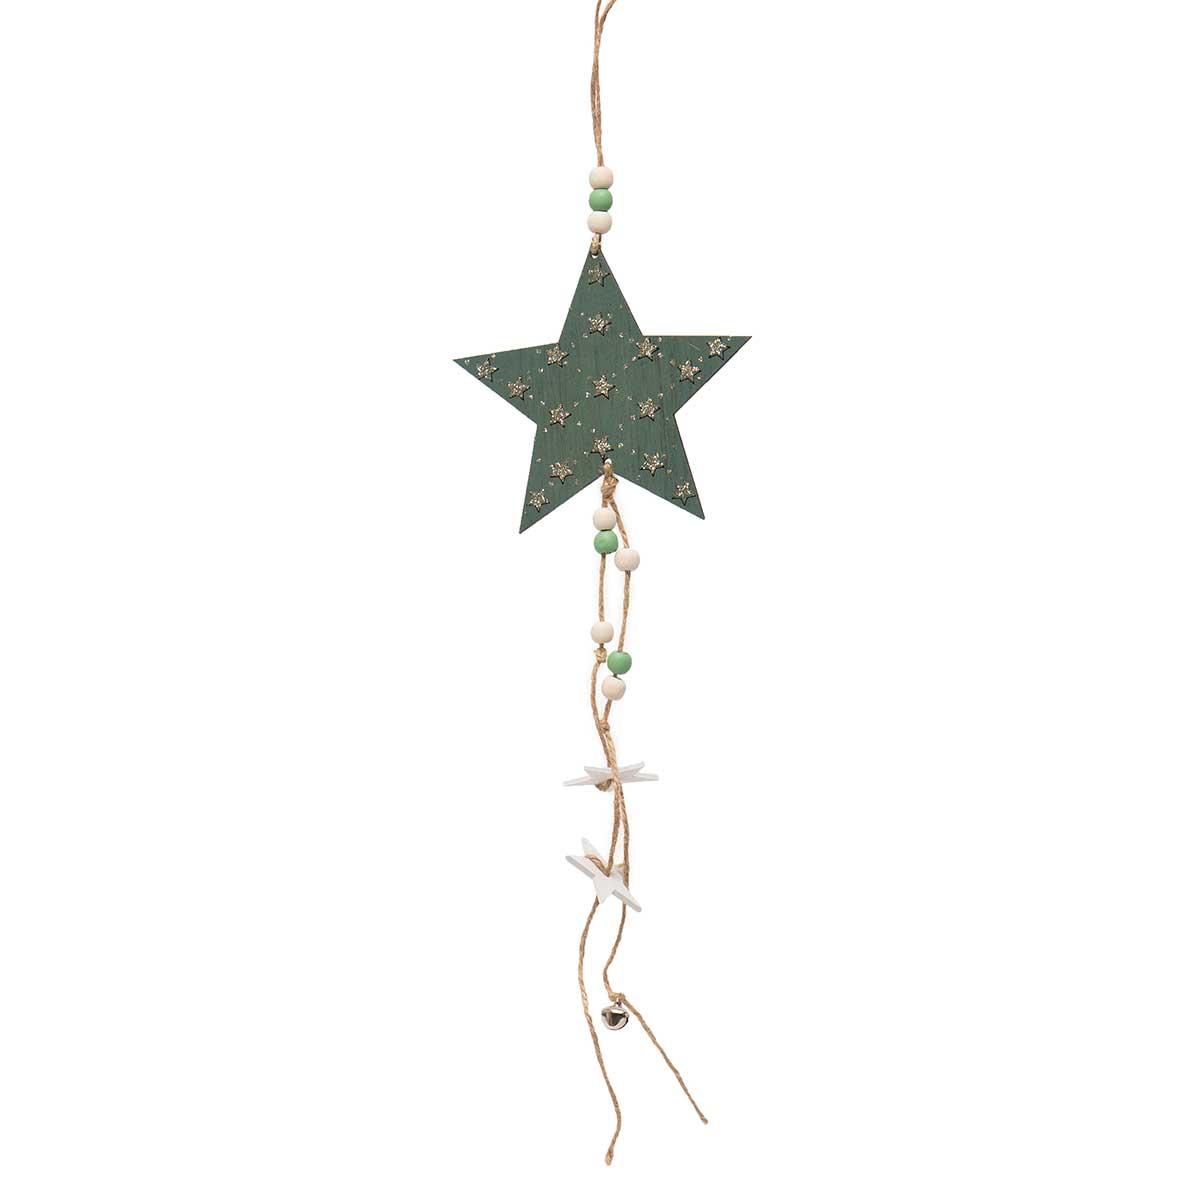 GREEN WOOD STAR DANGLE WITH GLITTER,